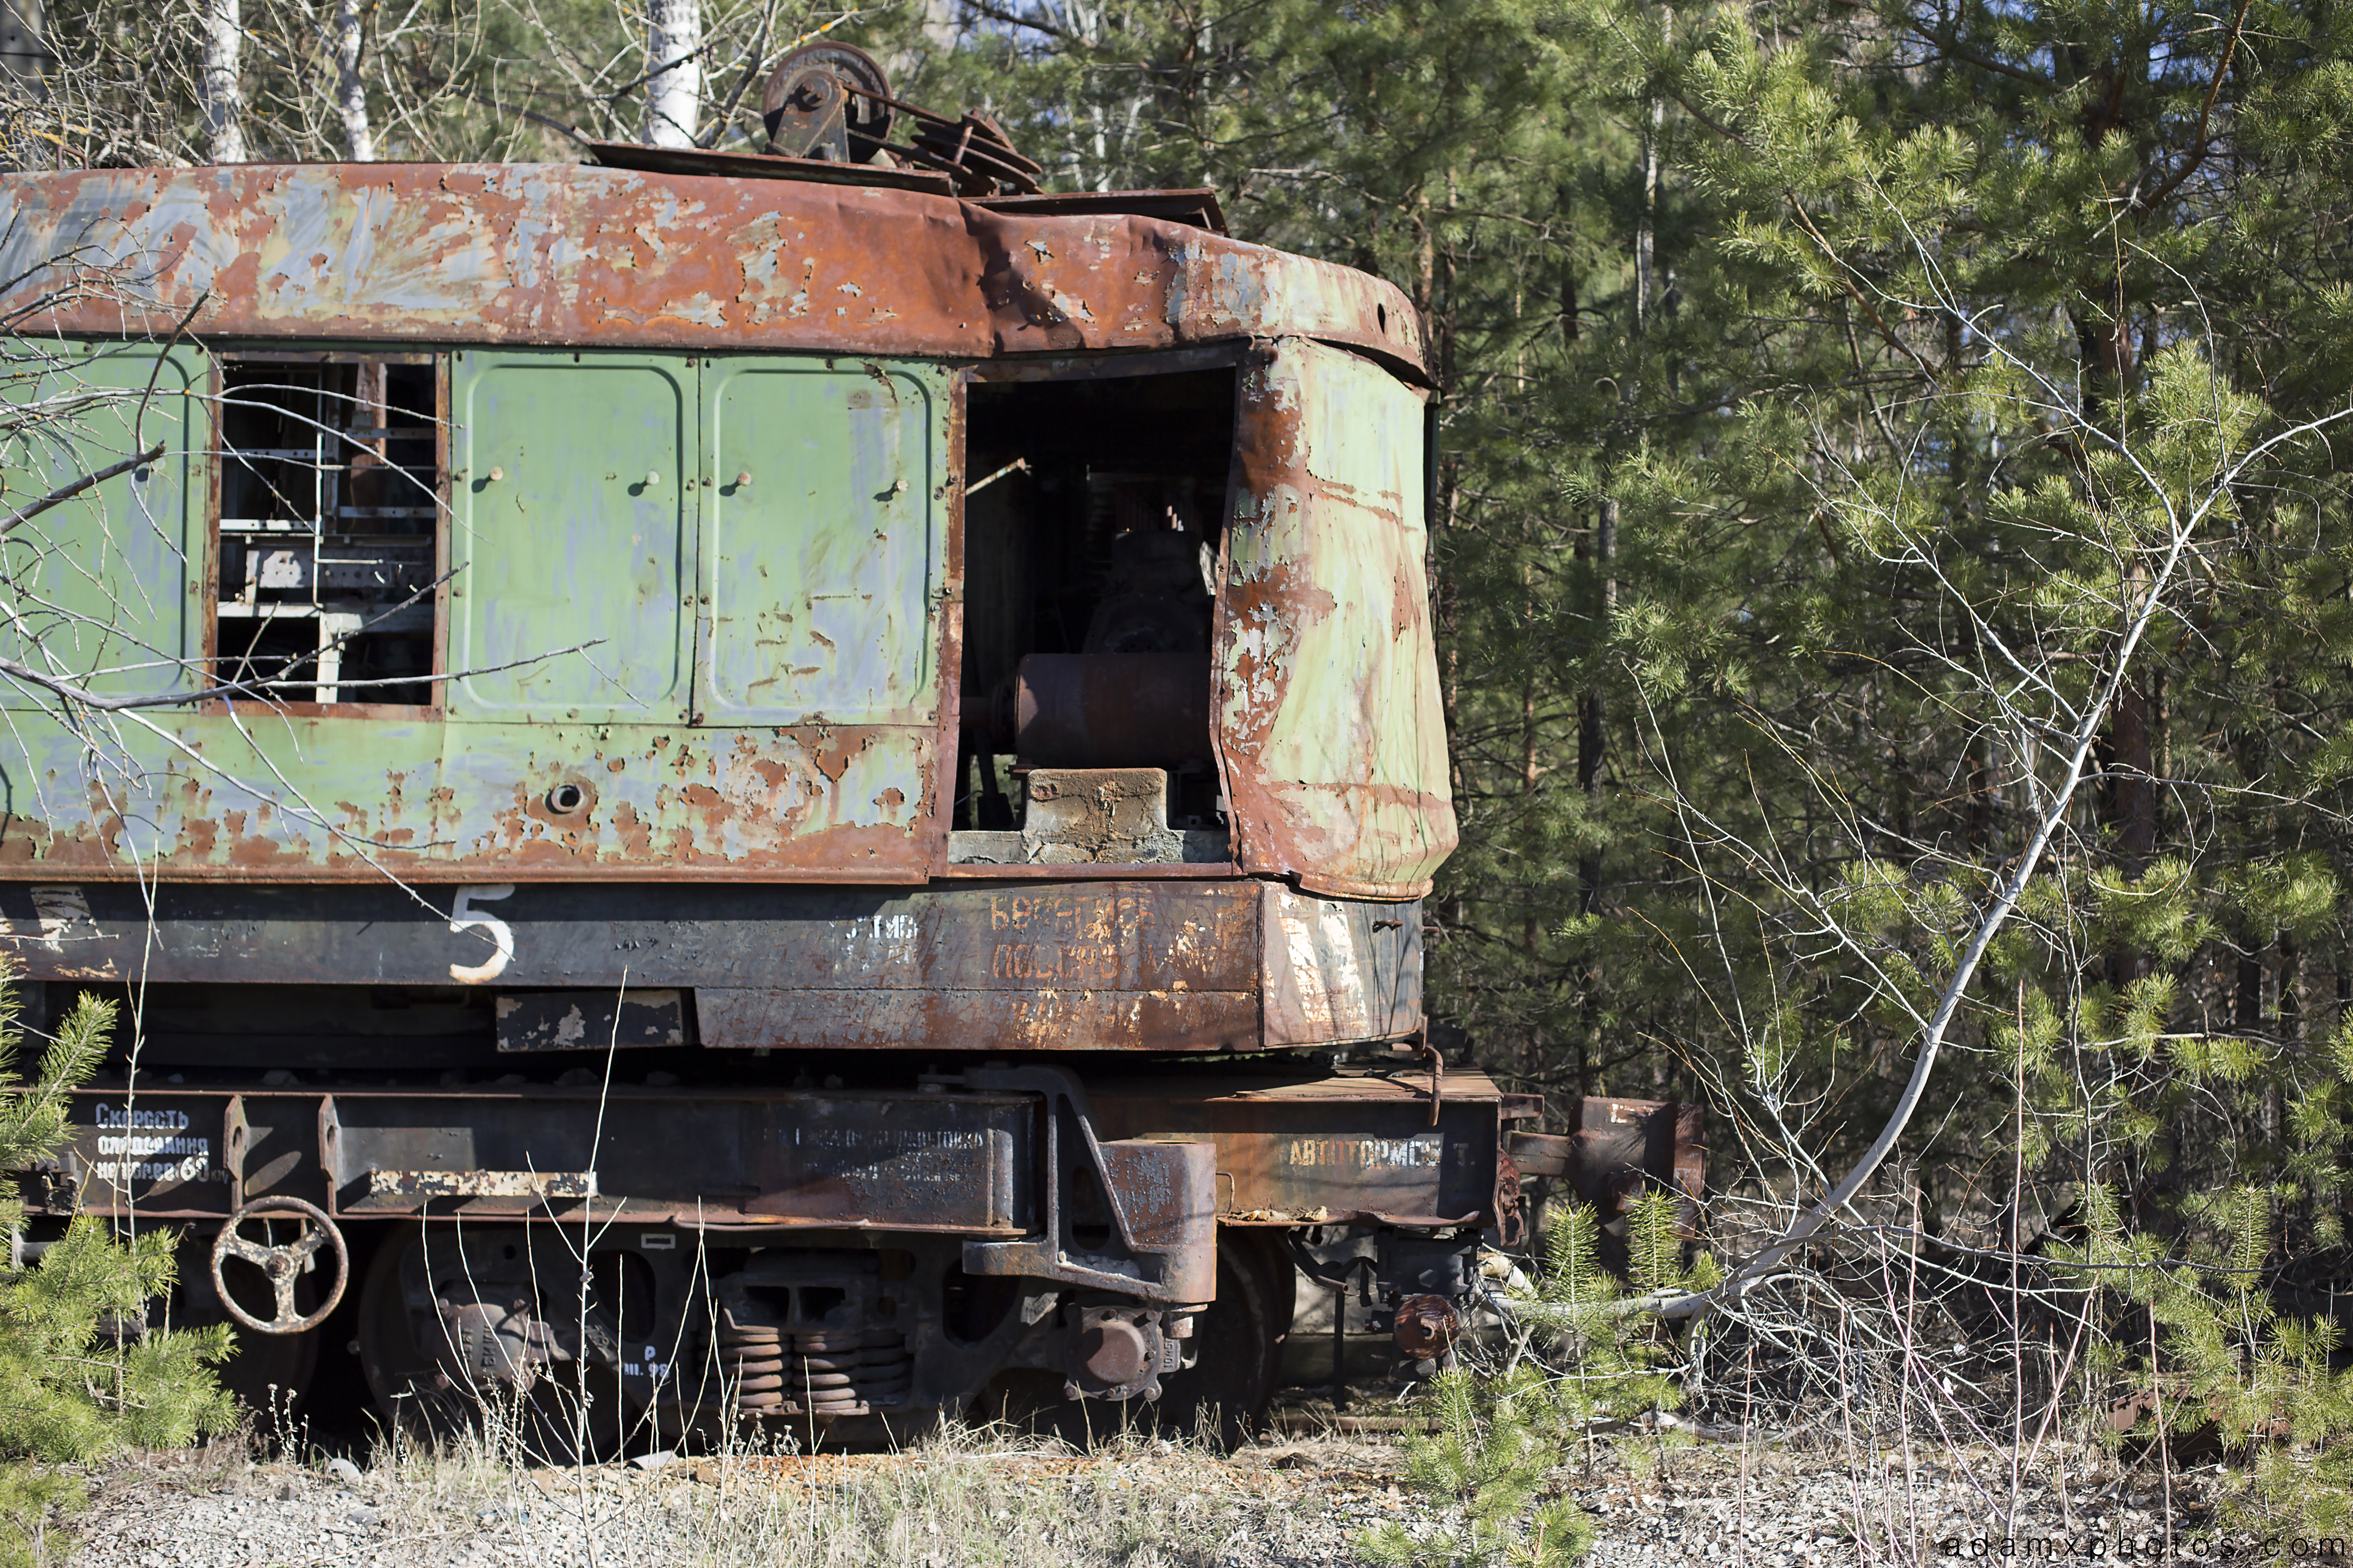 Yaniv Train station graveyard Chernobyl Pripyat Urbex Adam X Urban Exploration 2015 Abandoned decay lost forgotten derelict